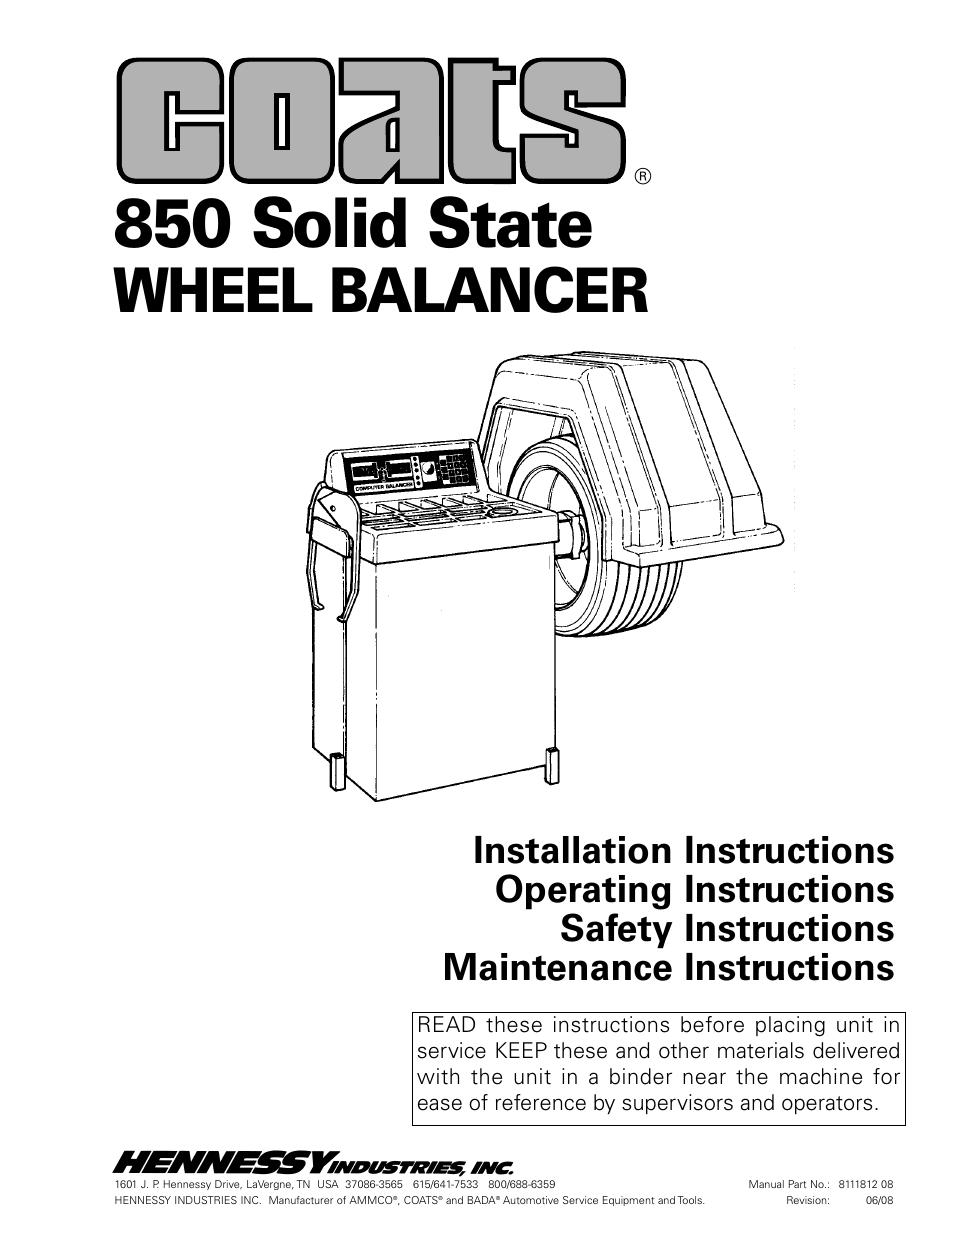 Coats 850 Solid State Wheel Balancer User Manual